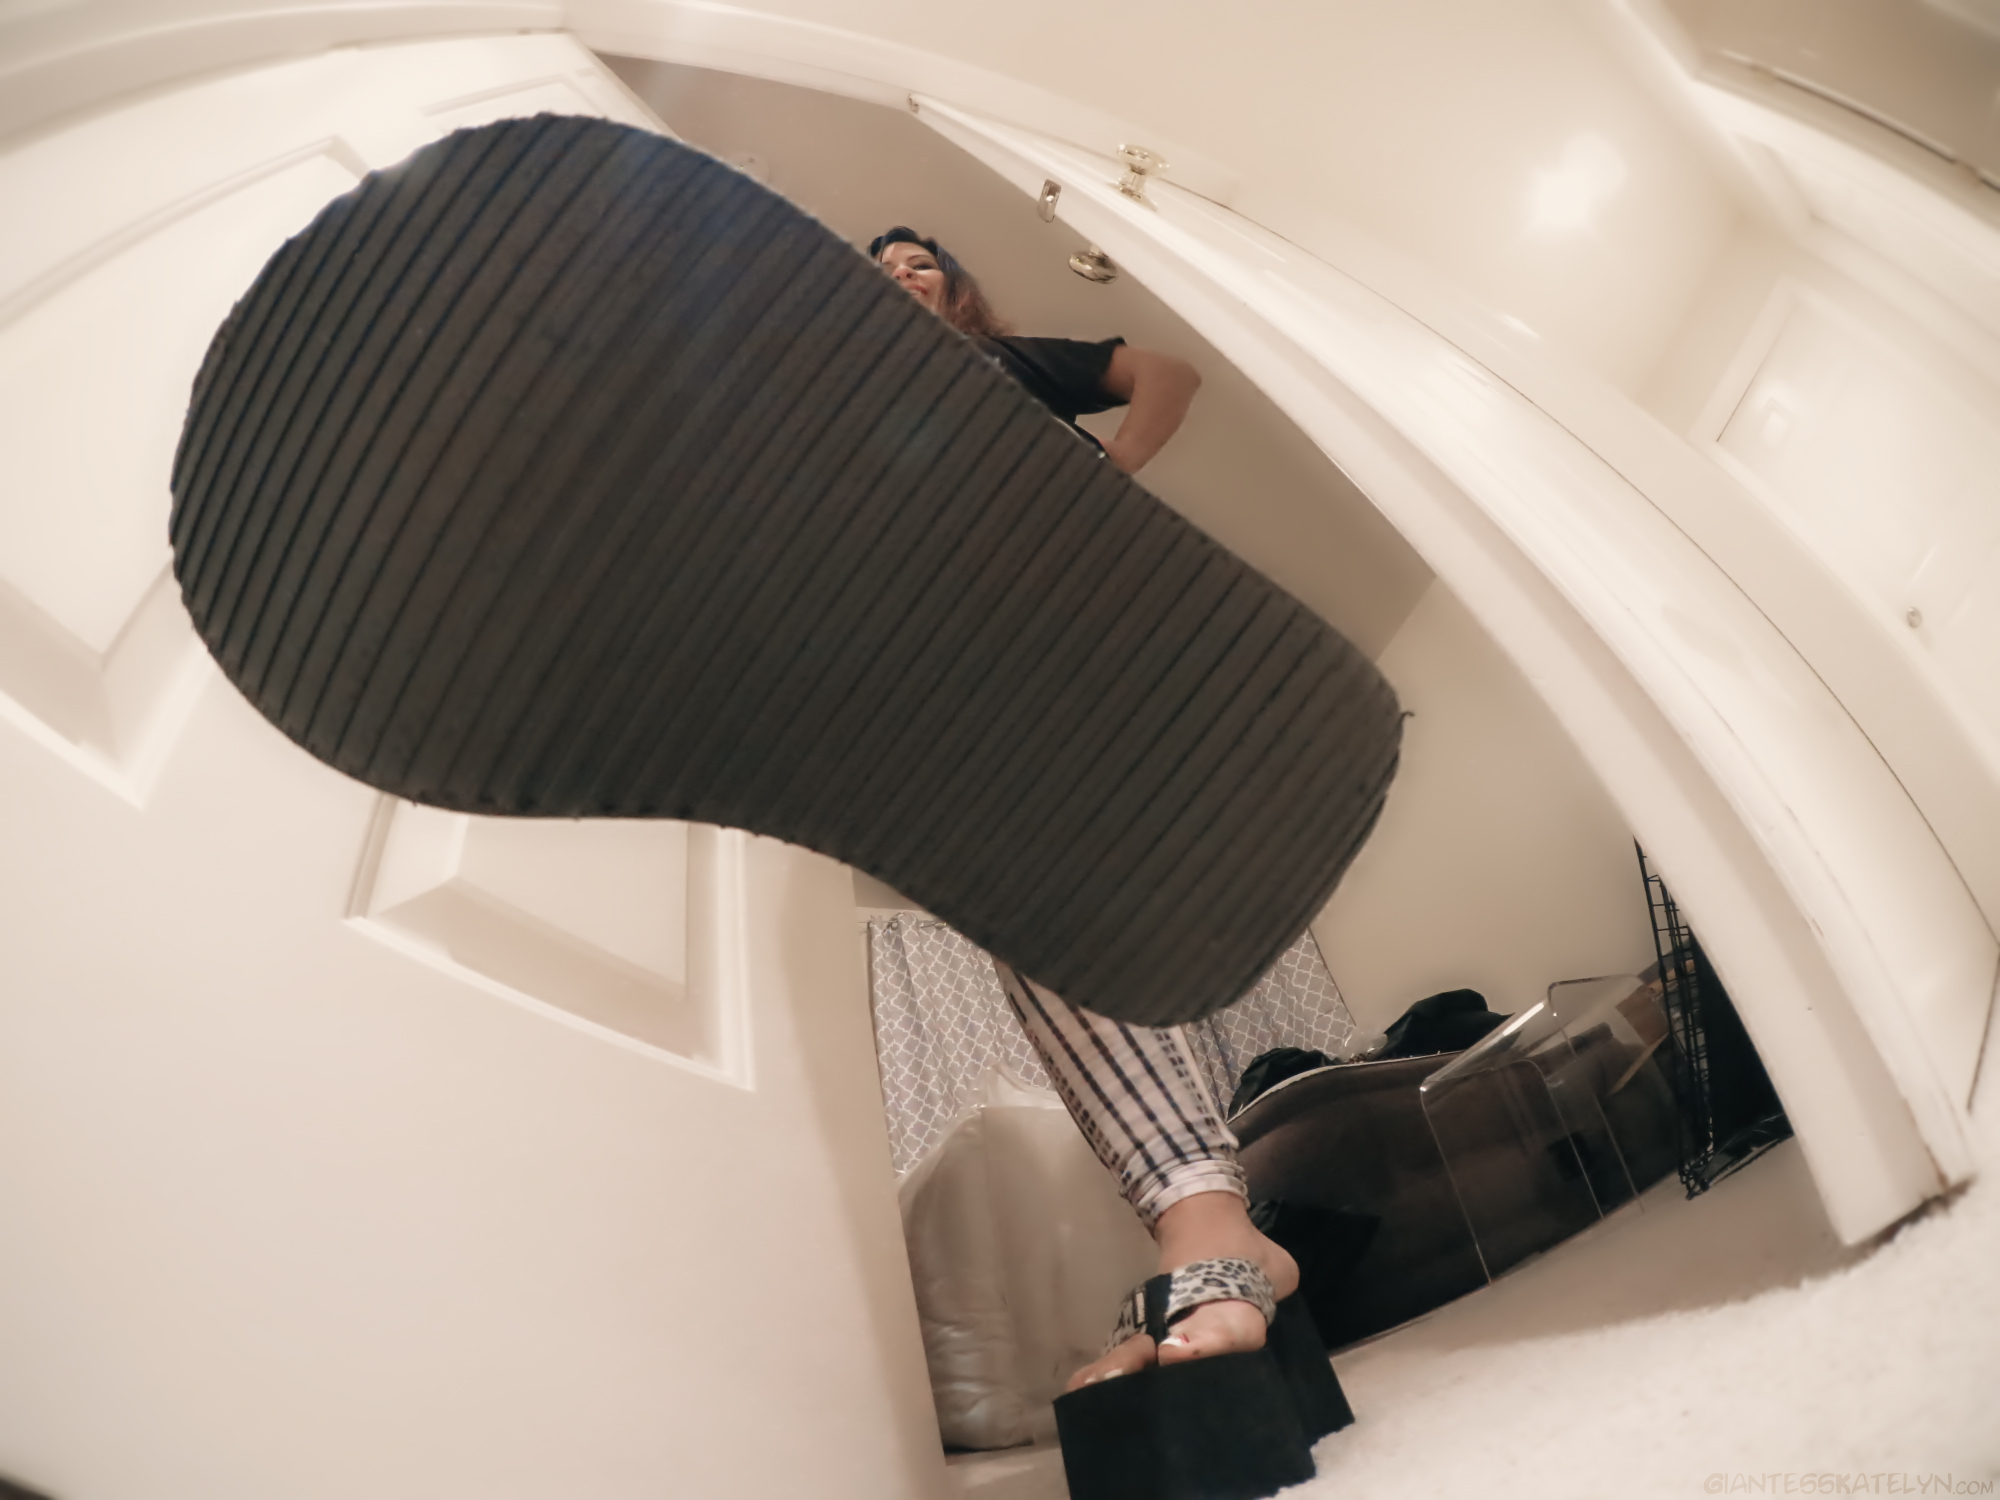 monster-platform-sandal-pov-16